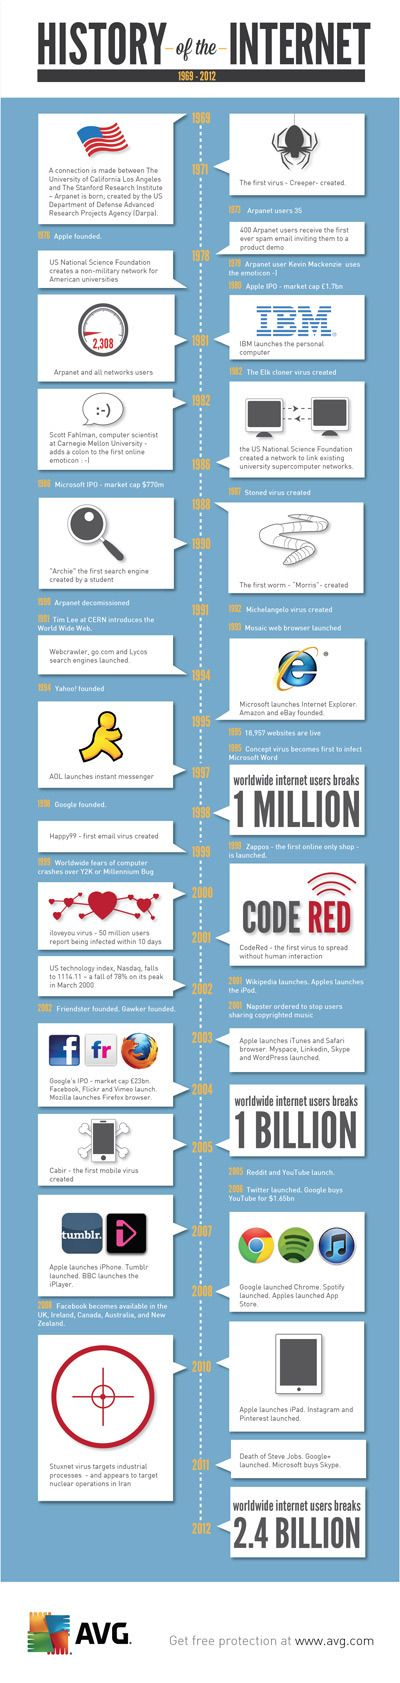 History of the Internet, bron: AVG